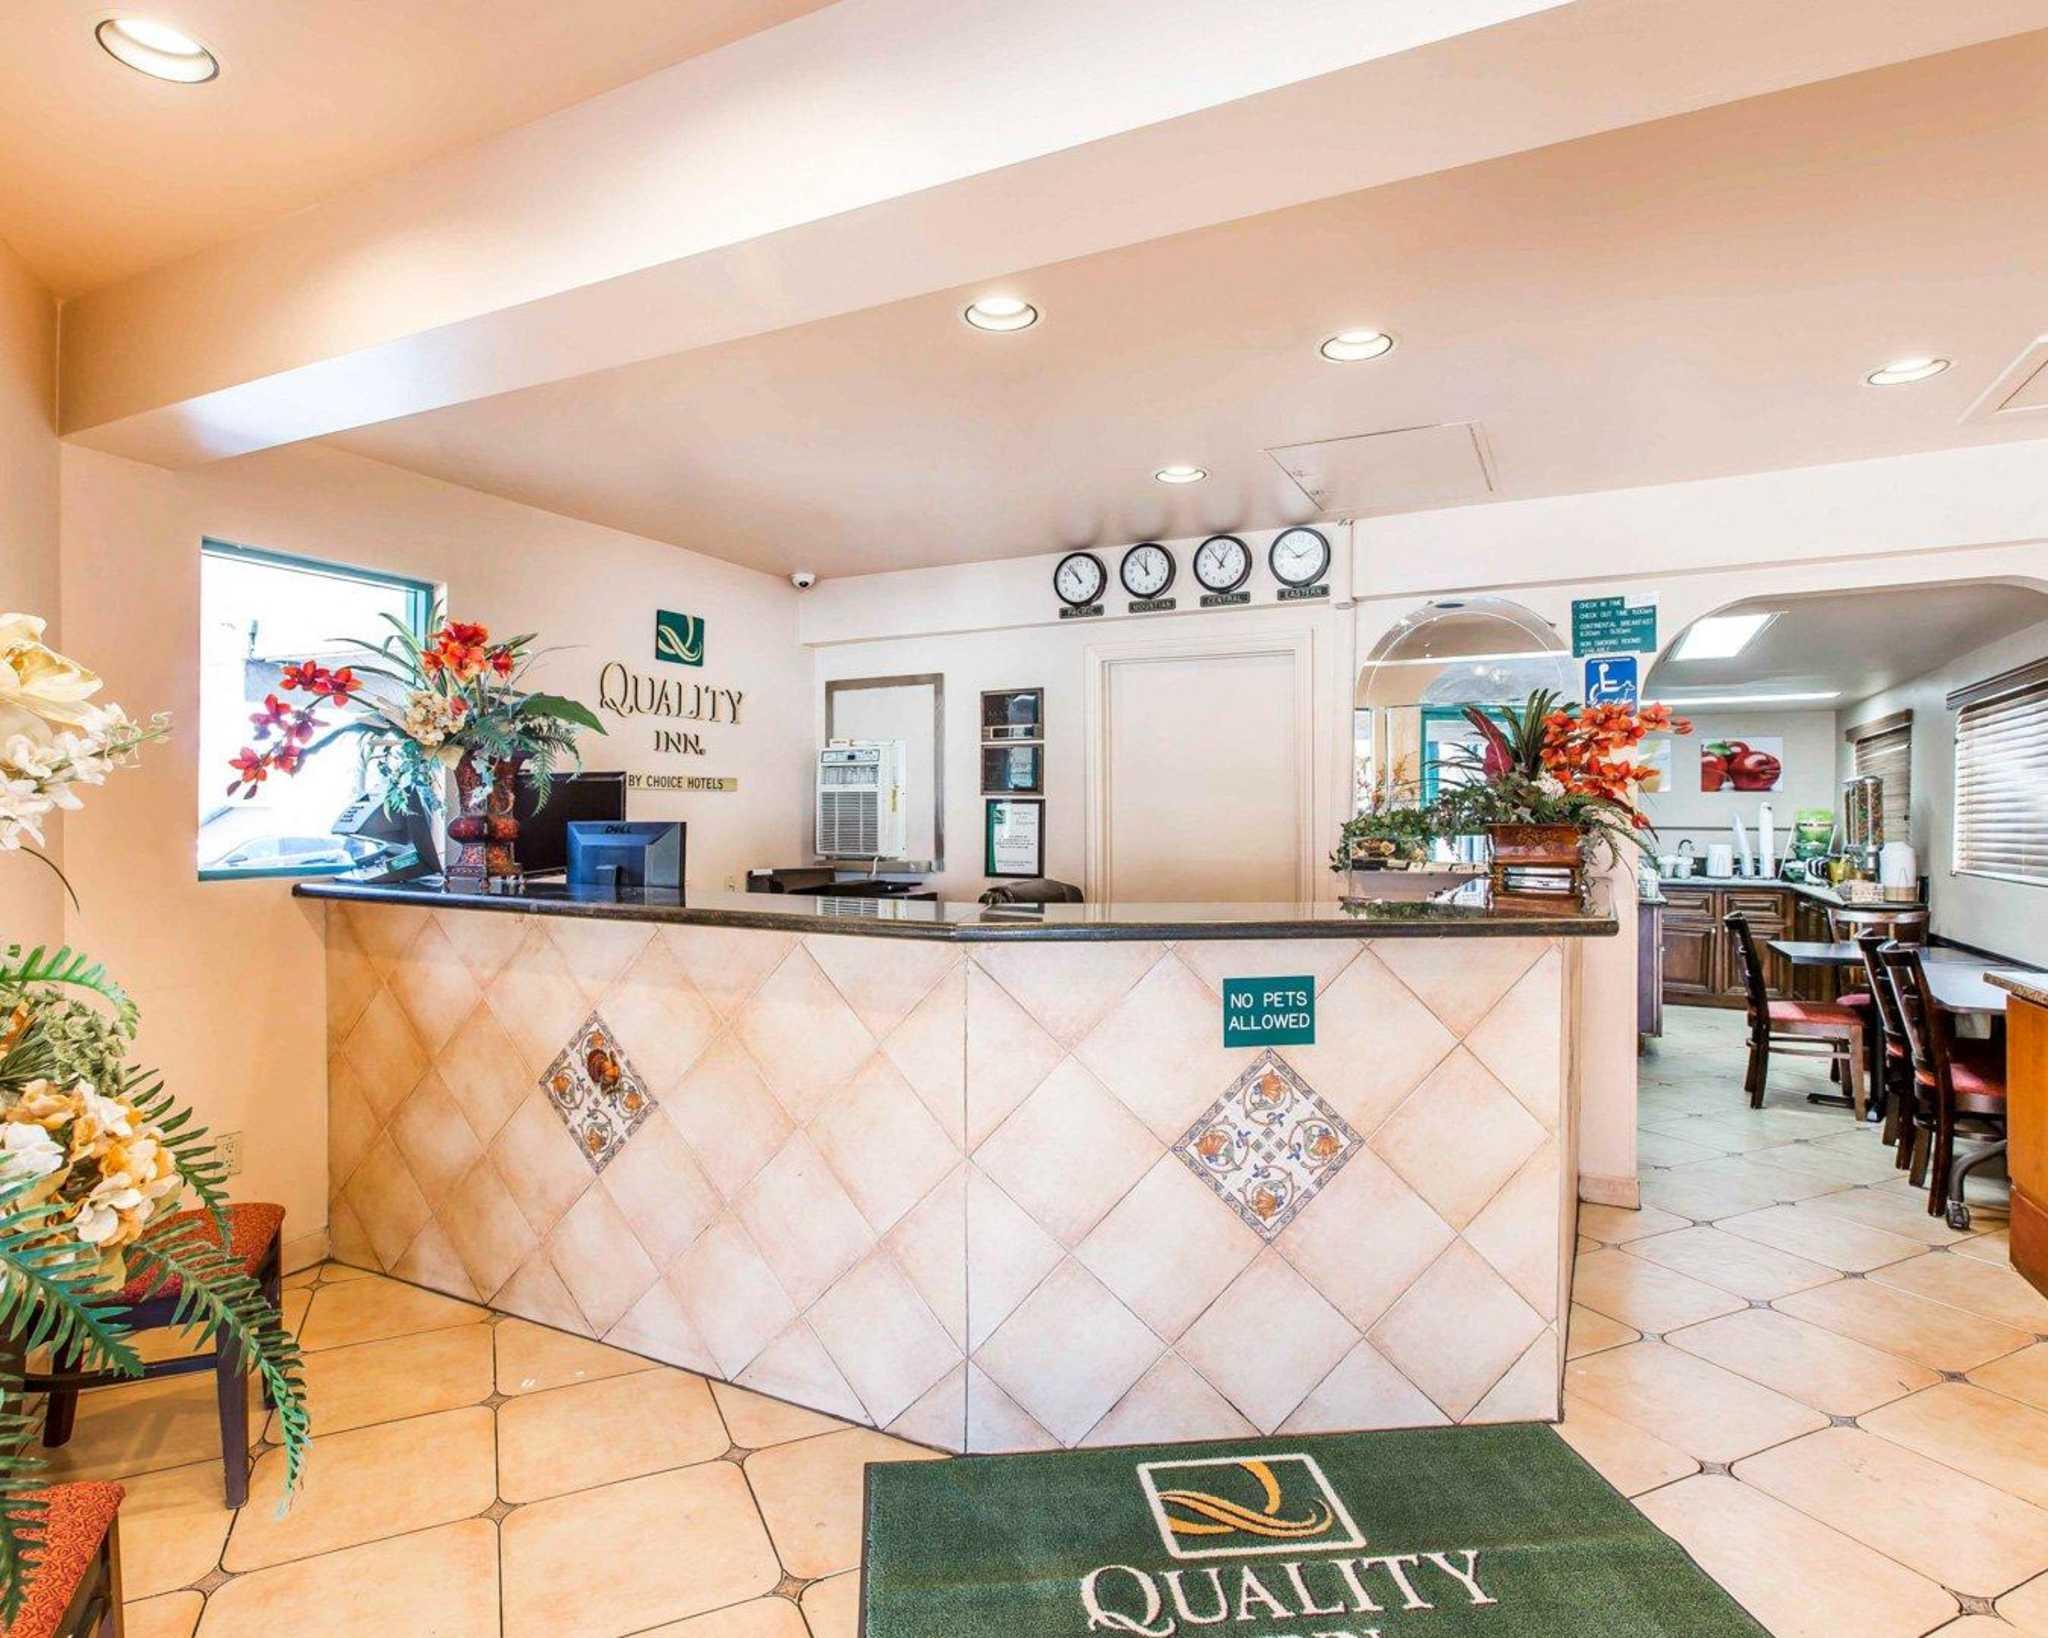 Quality Inn Burbank Airport image 26